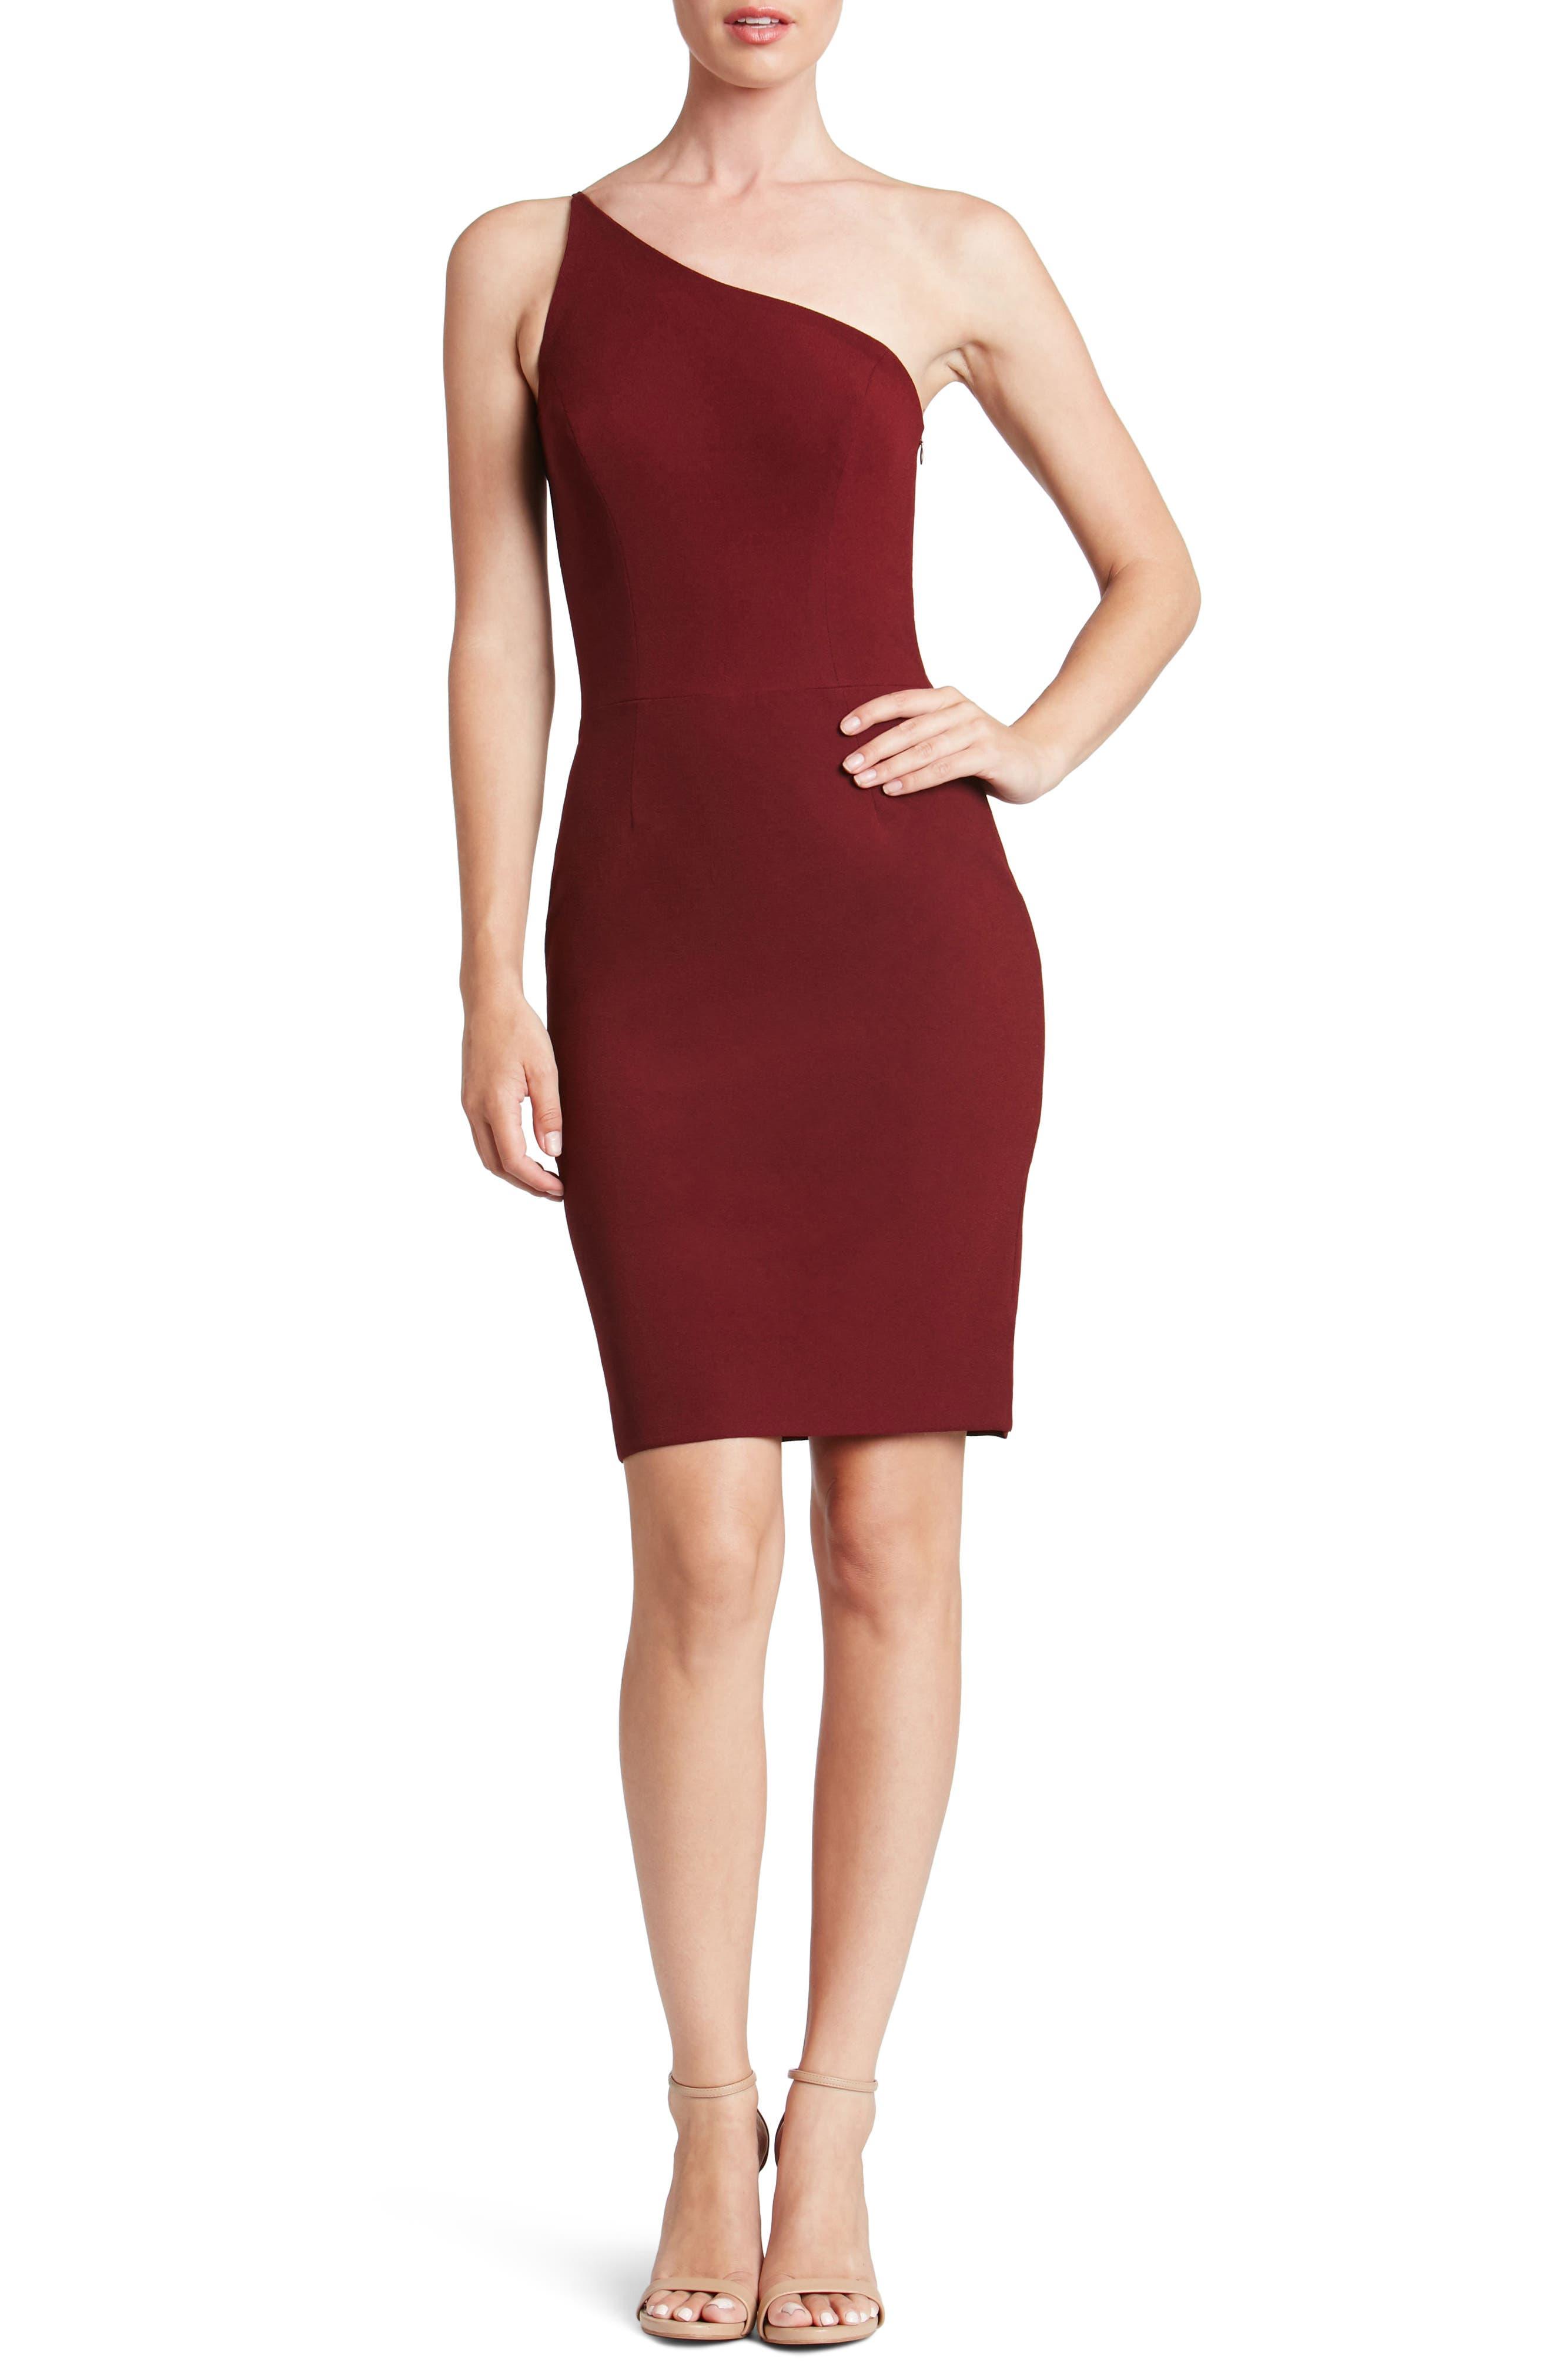 Jennifer One-Shoulder Body-Con Dress,                             Main thumbnail 1, color,                             Burgundy